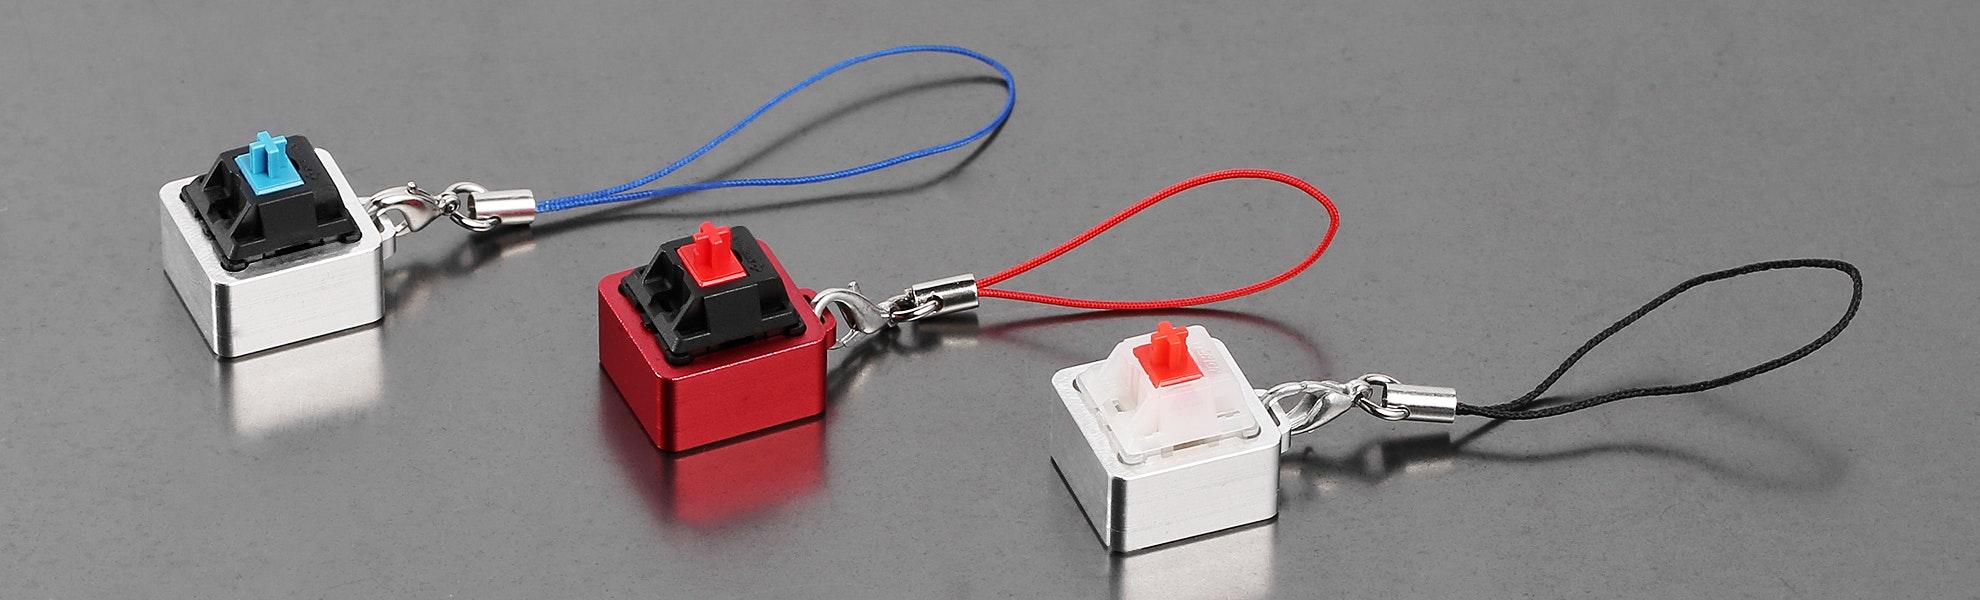 CNC Aluminum Cherry MX Keychain (2-Pack)